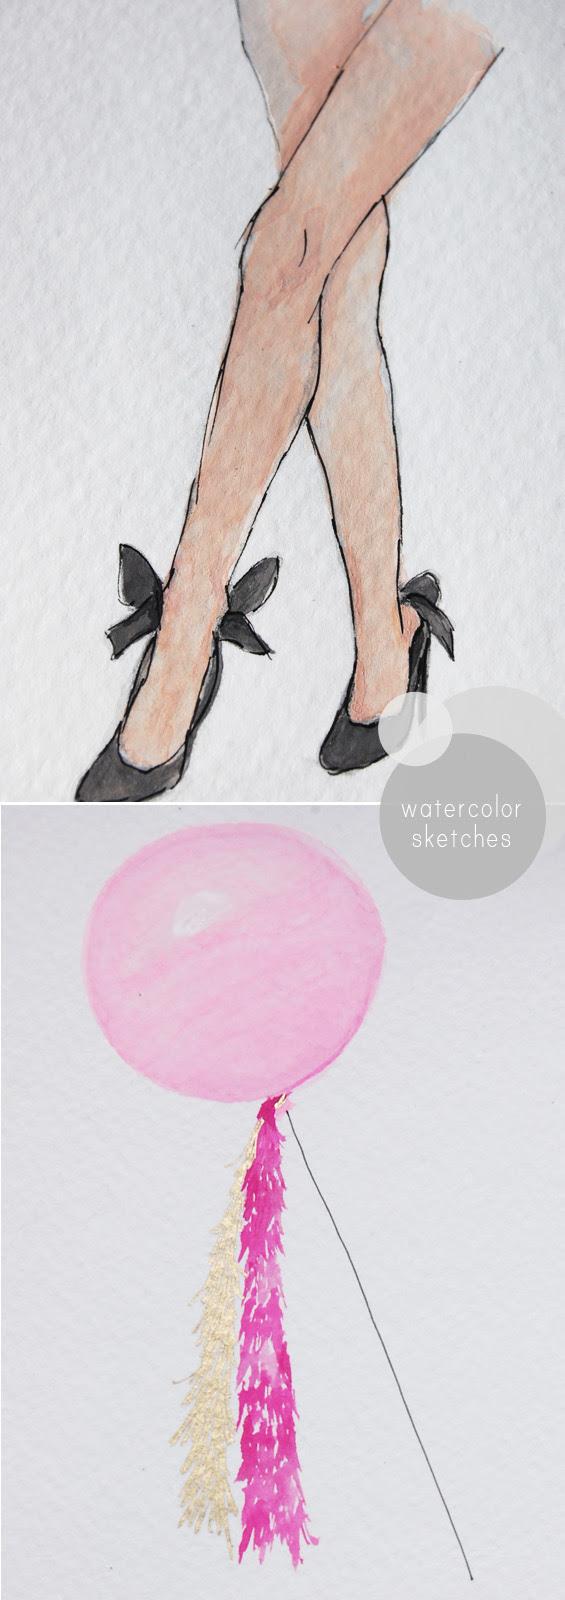 water color fashion sketch illustration legs